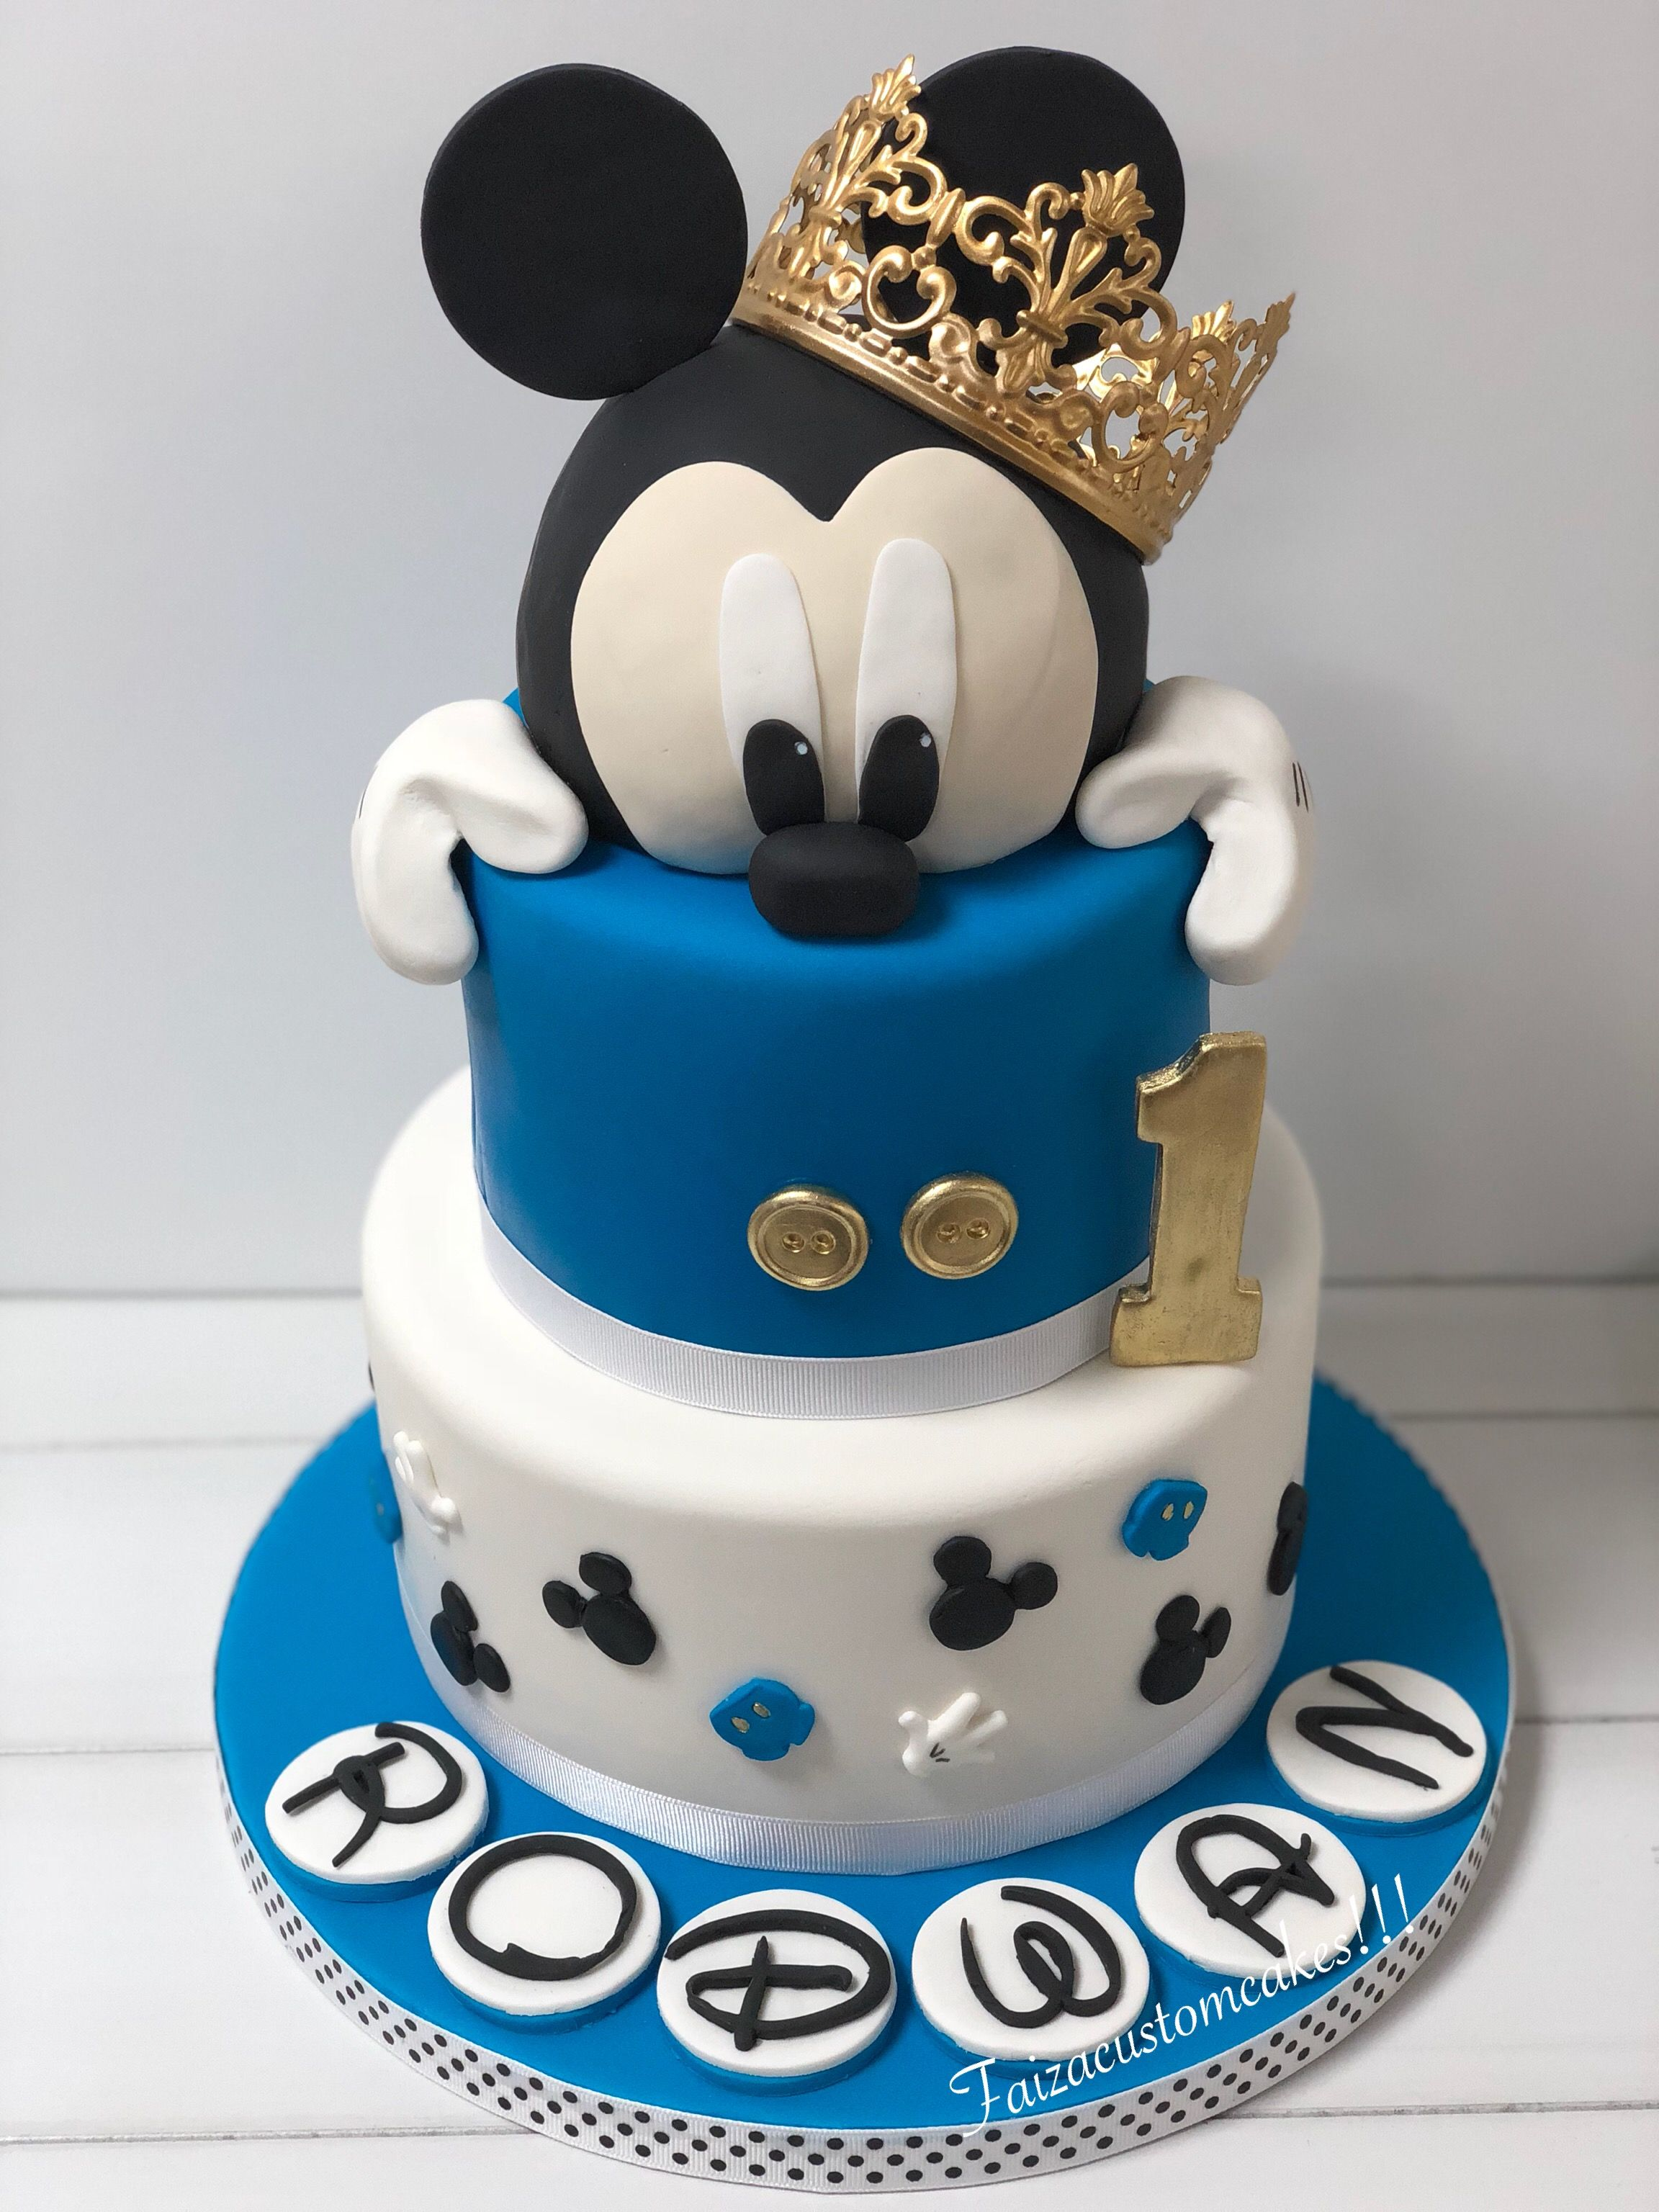 Mickey Mouse 1st Birthday Cake 💙💛💙💛 1st Birthday Cake